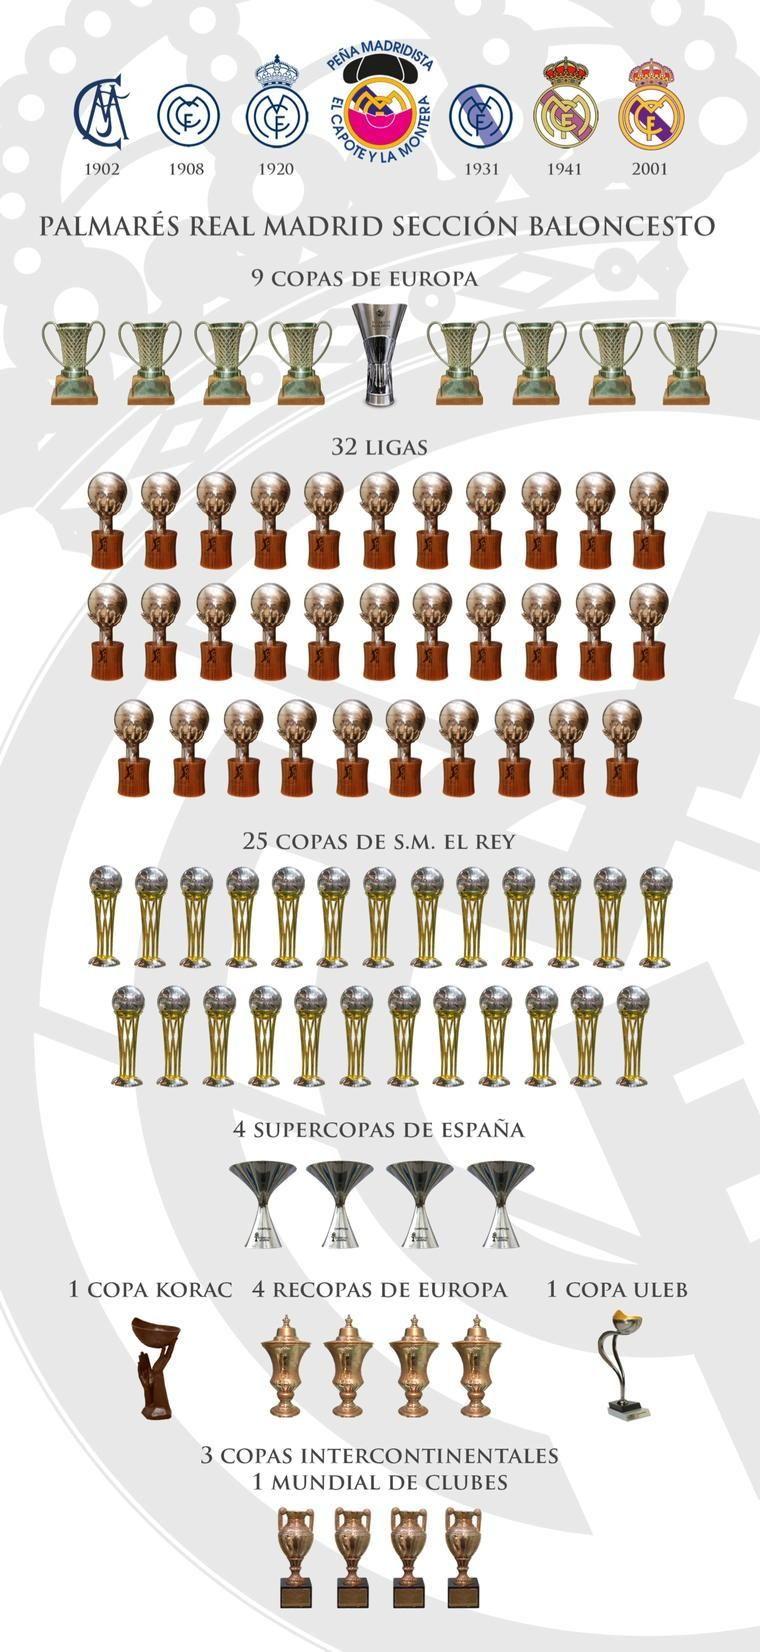 Palmarés actualizado #campeonesACB #32ligas #PalizaAlBarça